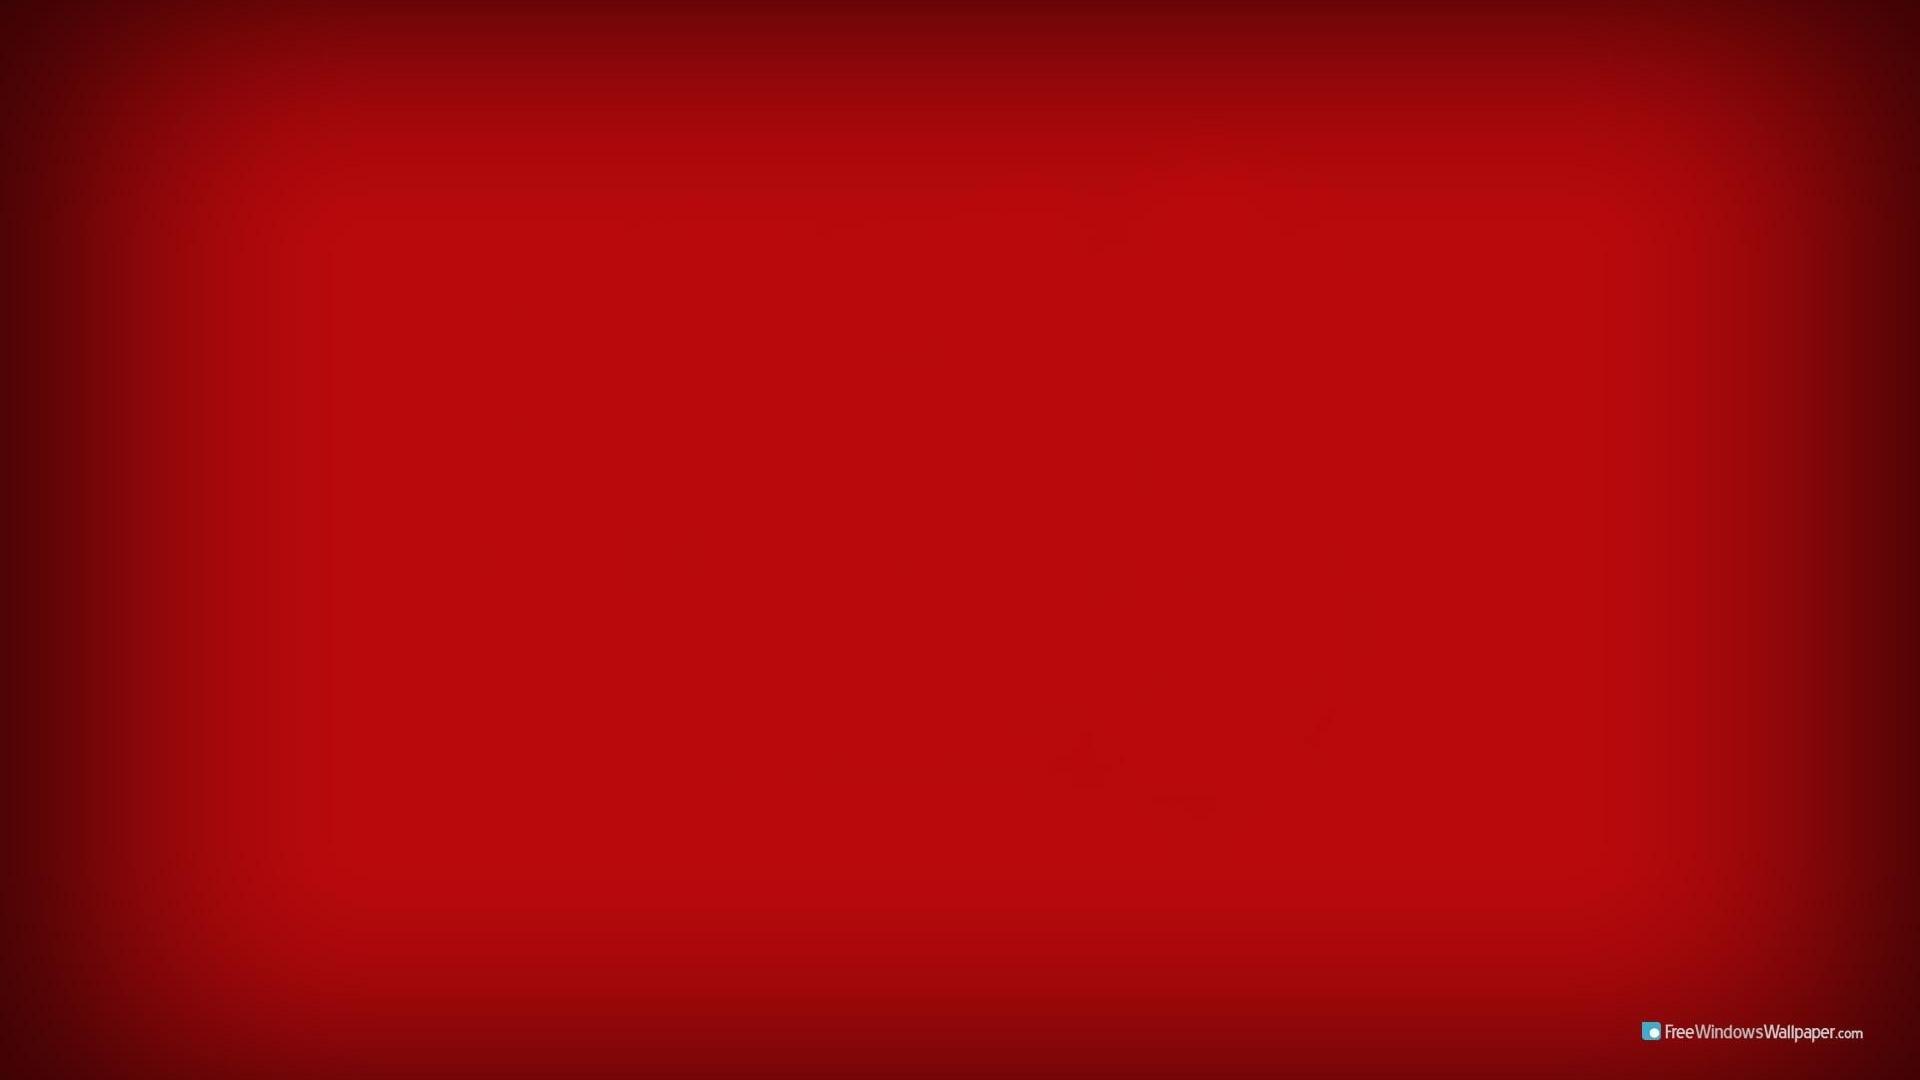 red wallpaper 1920x1080